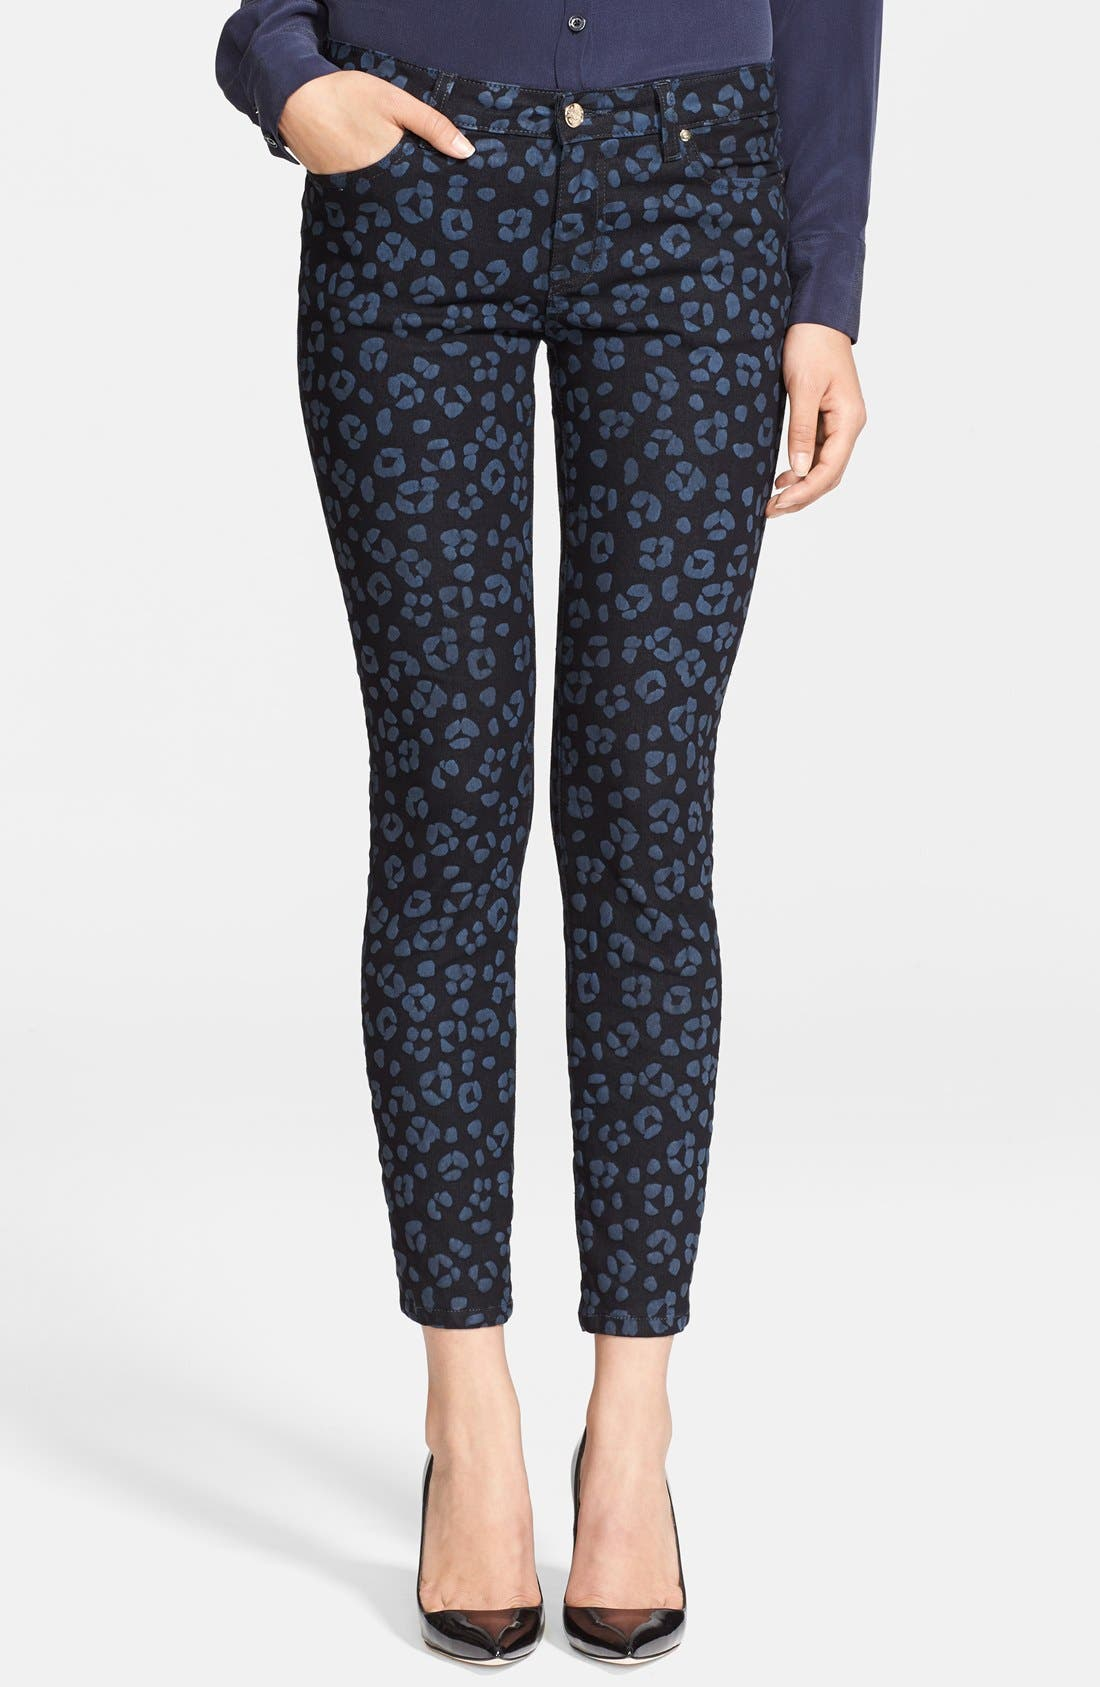 Main Image - kate spade new york 'broome street' cheetah print jeans (black)